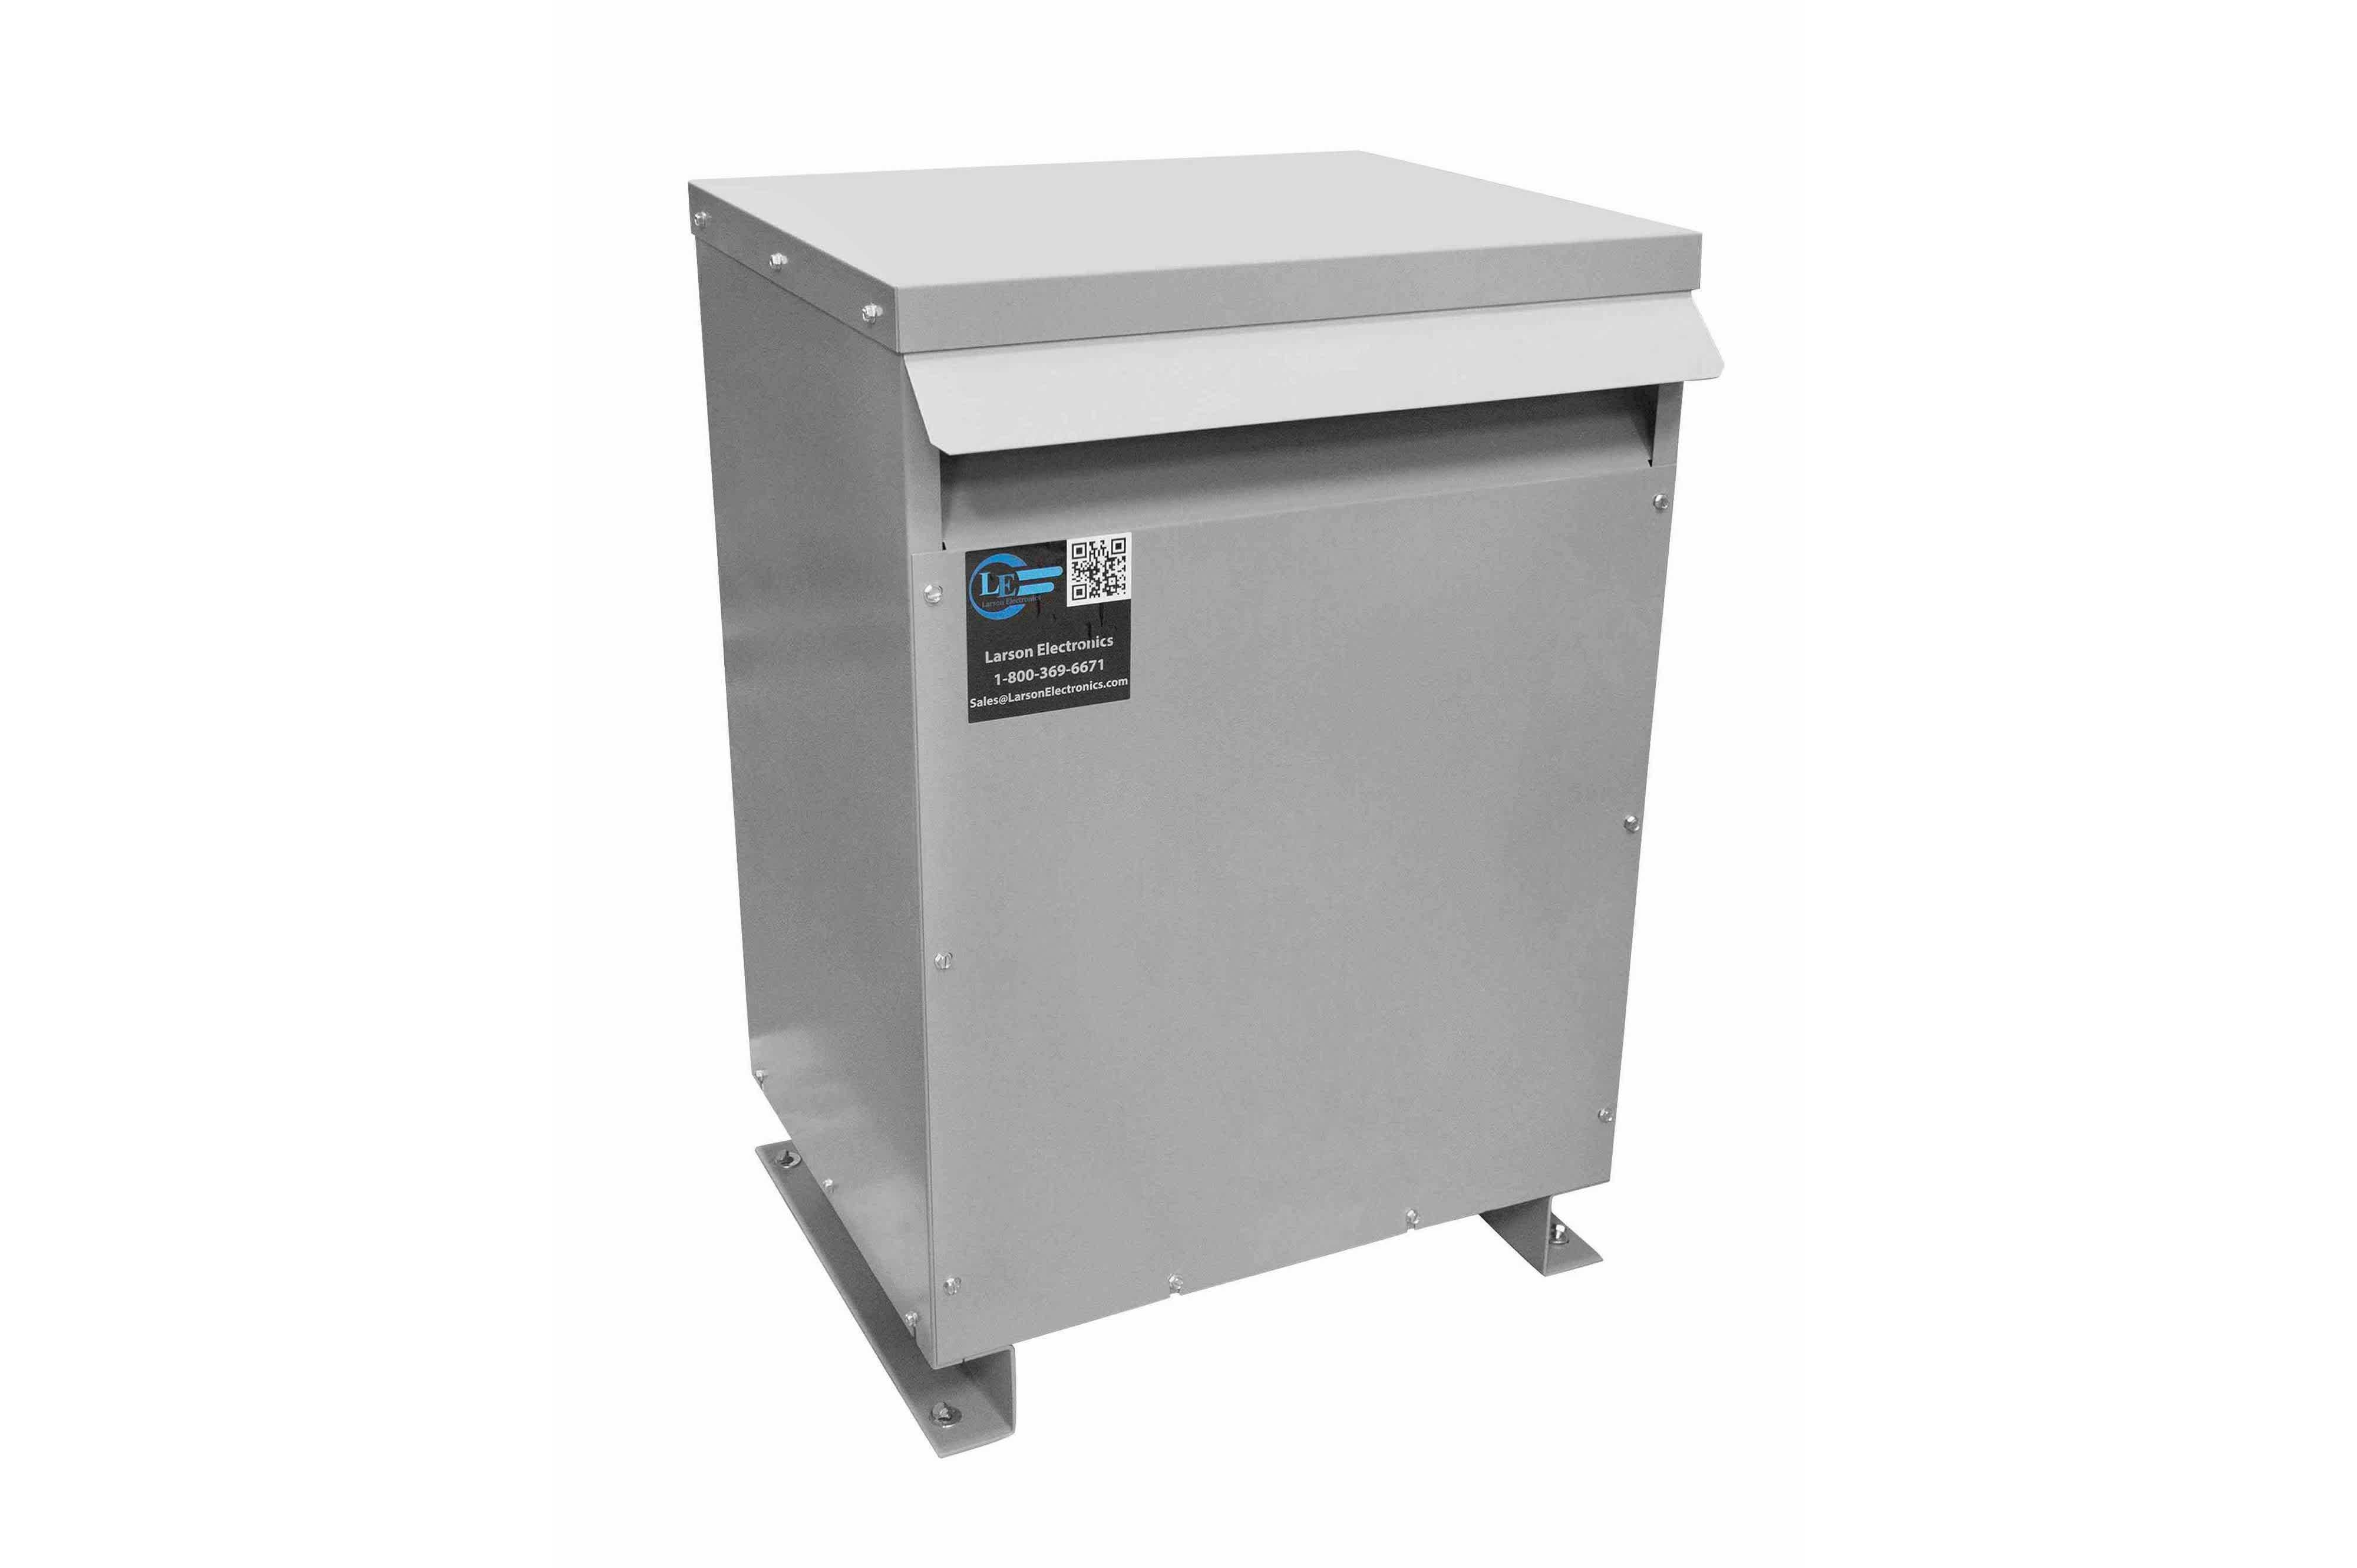 250 kVA 3PH Isolation Transformer, 208V Wye Primary, 400Y/231 Wye-N Secondary, N3R, Ventilated, 60 Hz